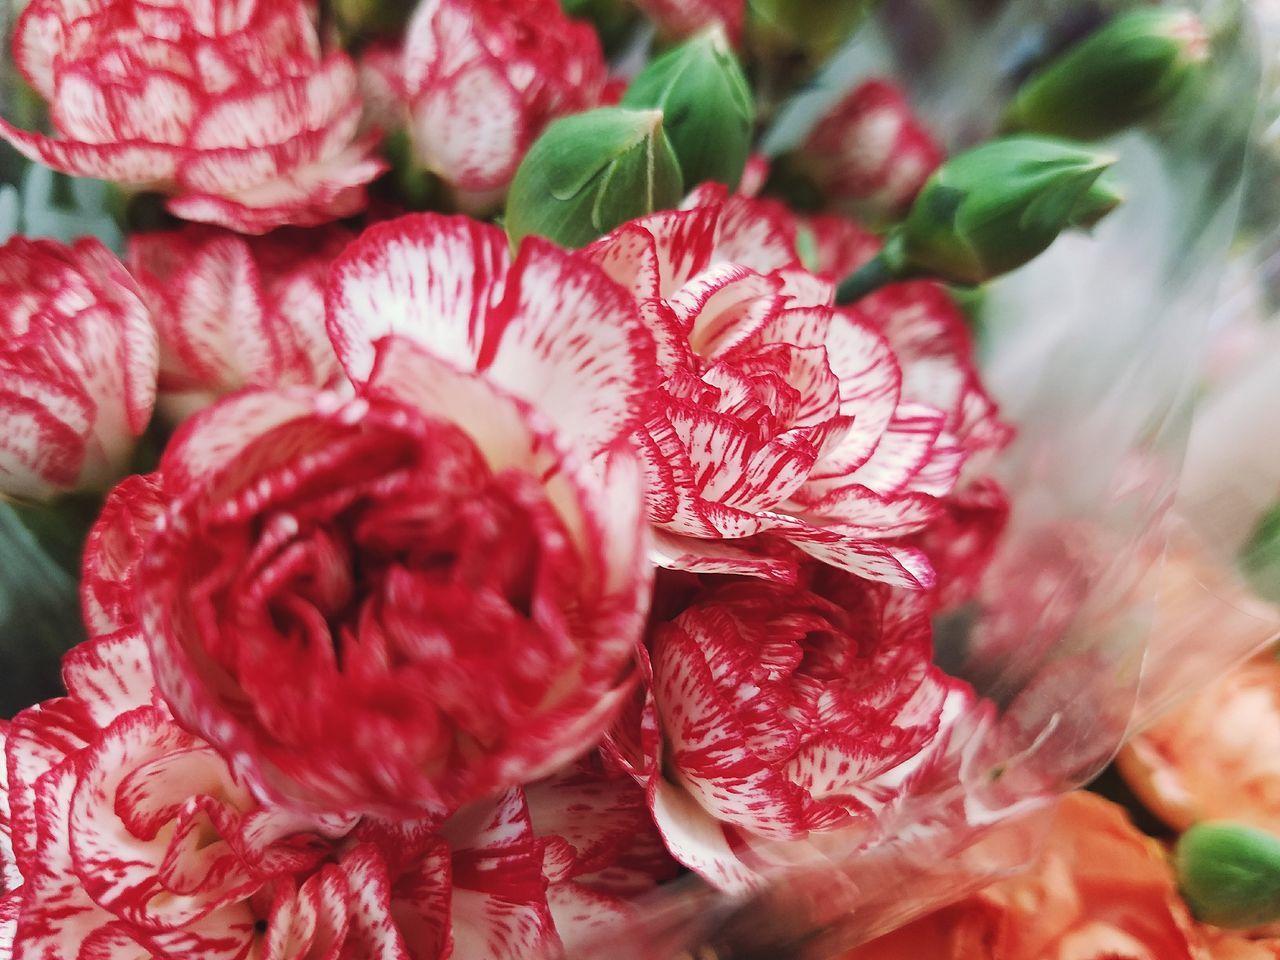 Supermarket Flowers. Flower Flower Head Red Close-up Plant EyeEm Best Shots Freshness EyeEm Selects EyeEm Patterns In Nature